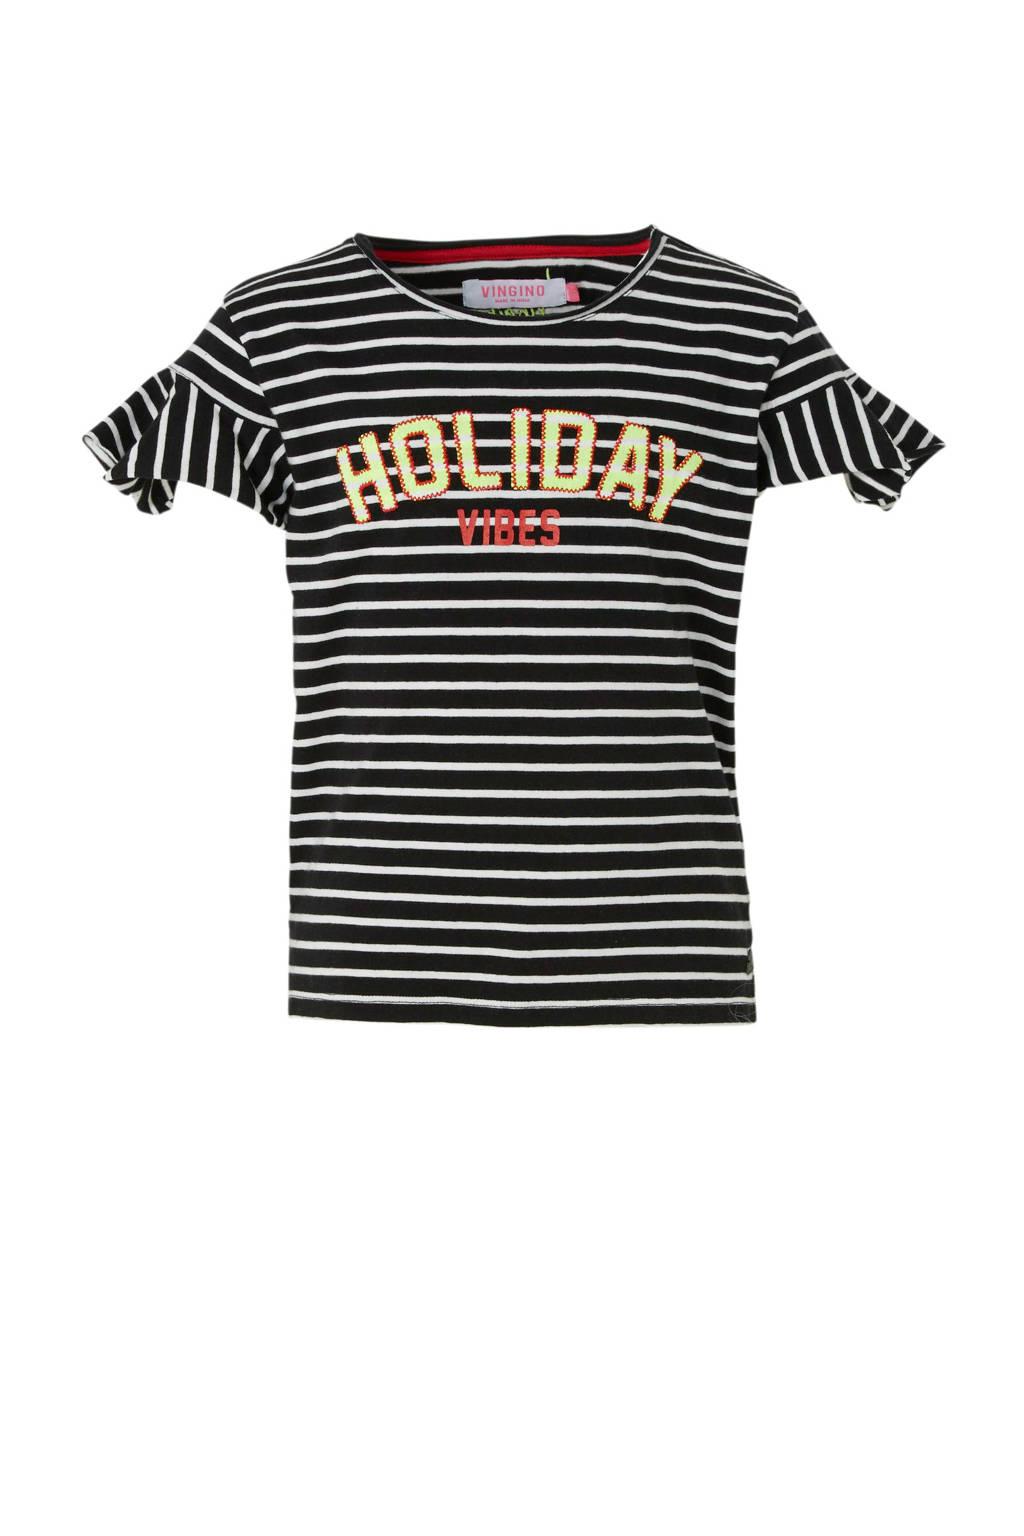 Vingino gestreept T-shirt Izem zwart, Zwart/wit/rood/geel